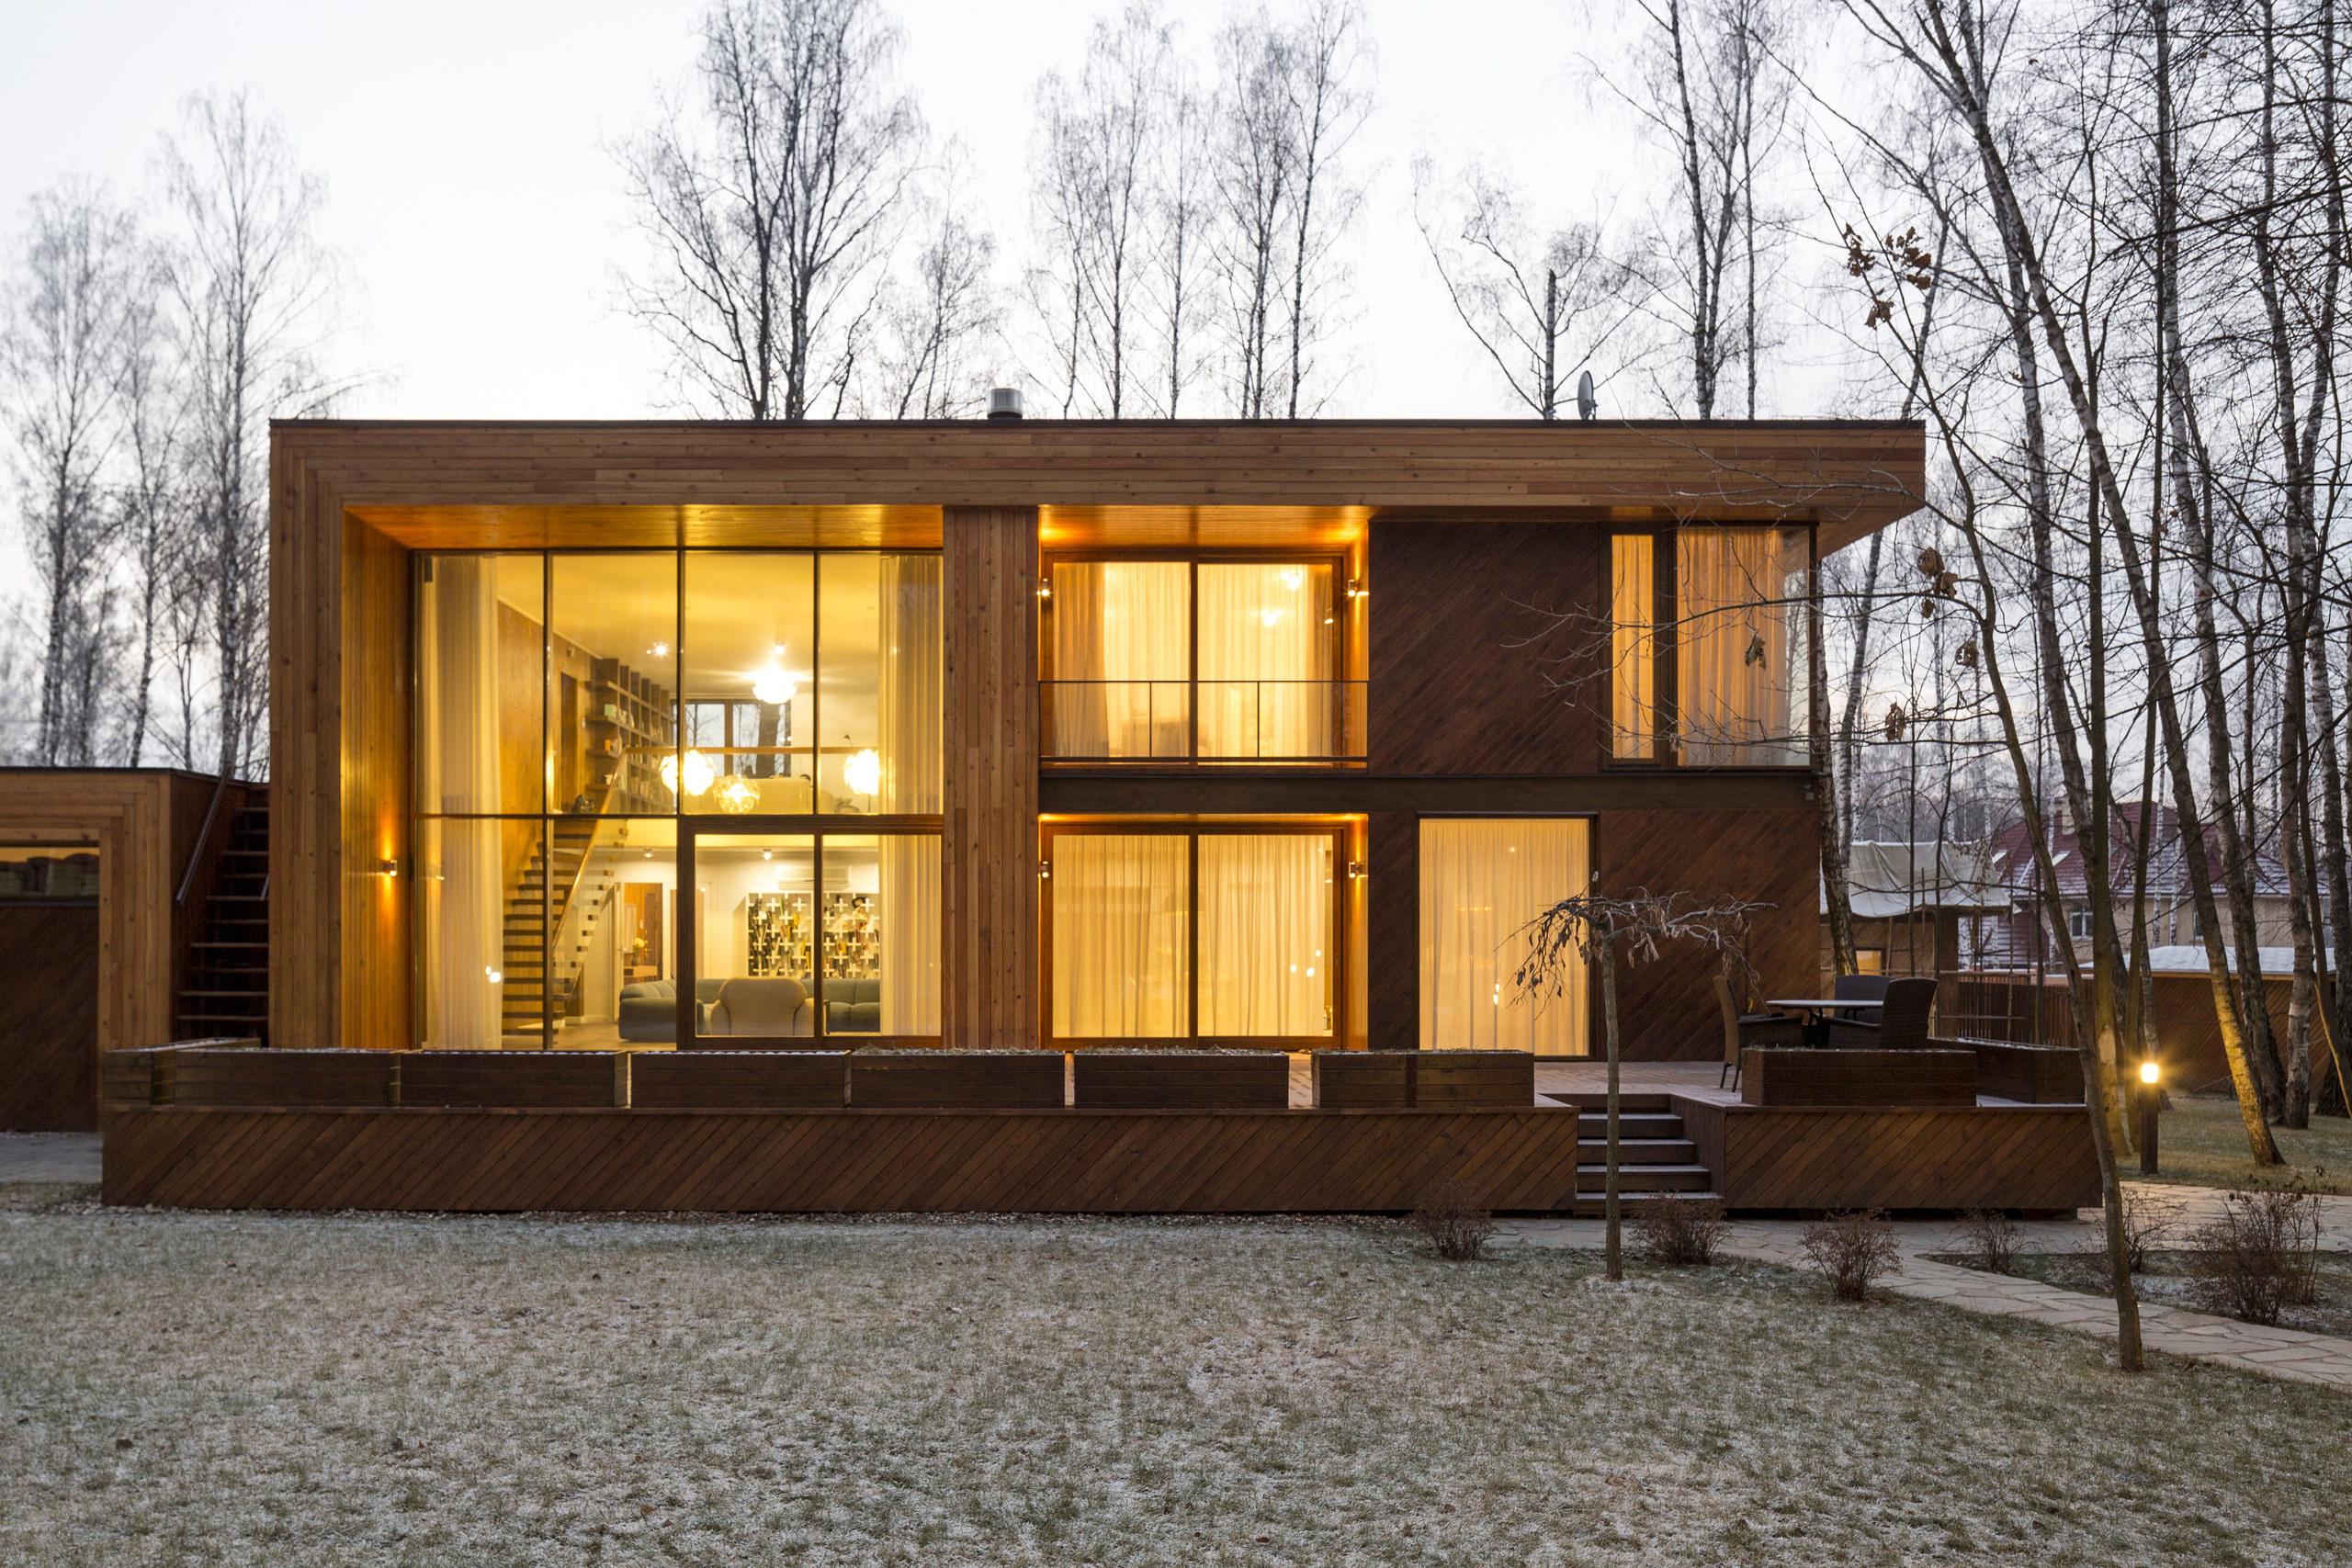 House in Birch Forest by Aleksandr Zhidkov